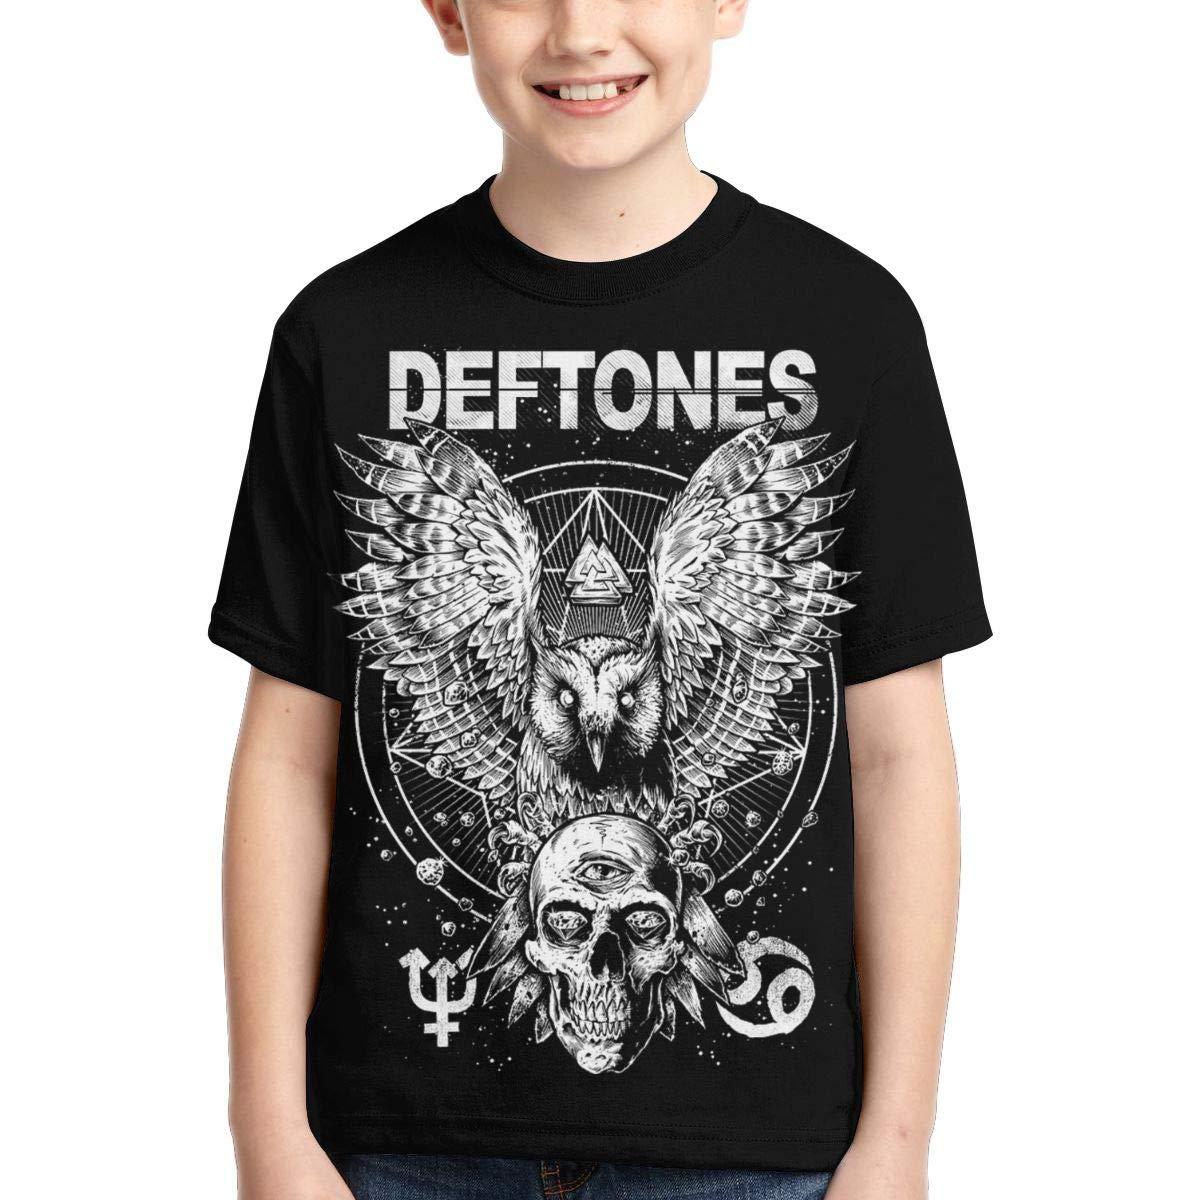 Caiyuzhuanmai Boys,Girls,Youth Deftones Tshirts